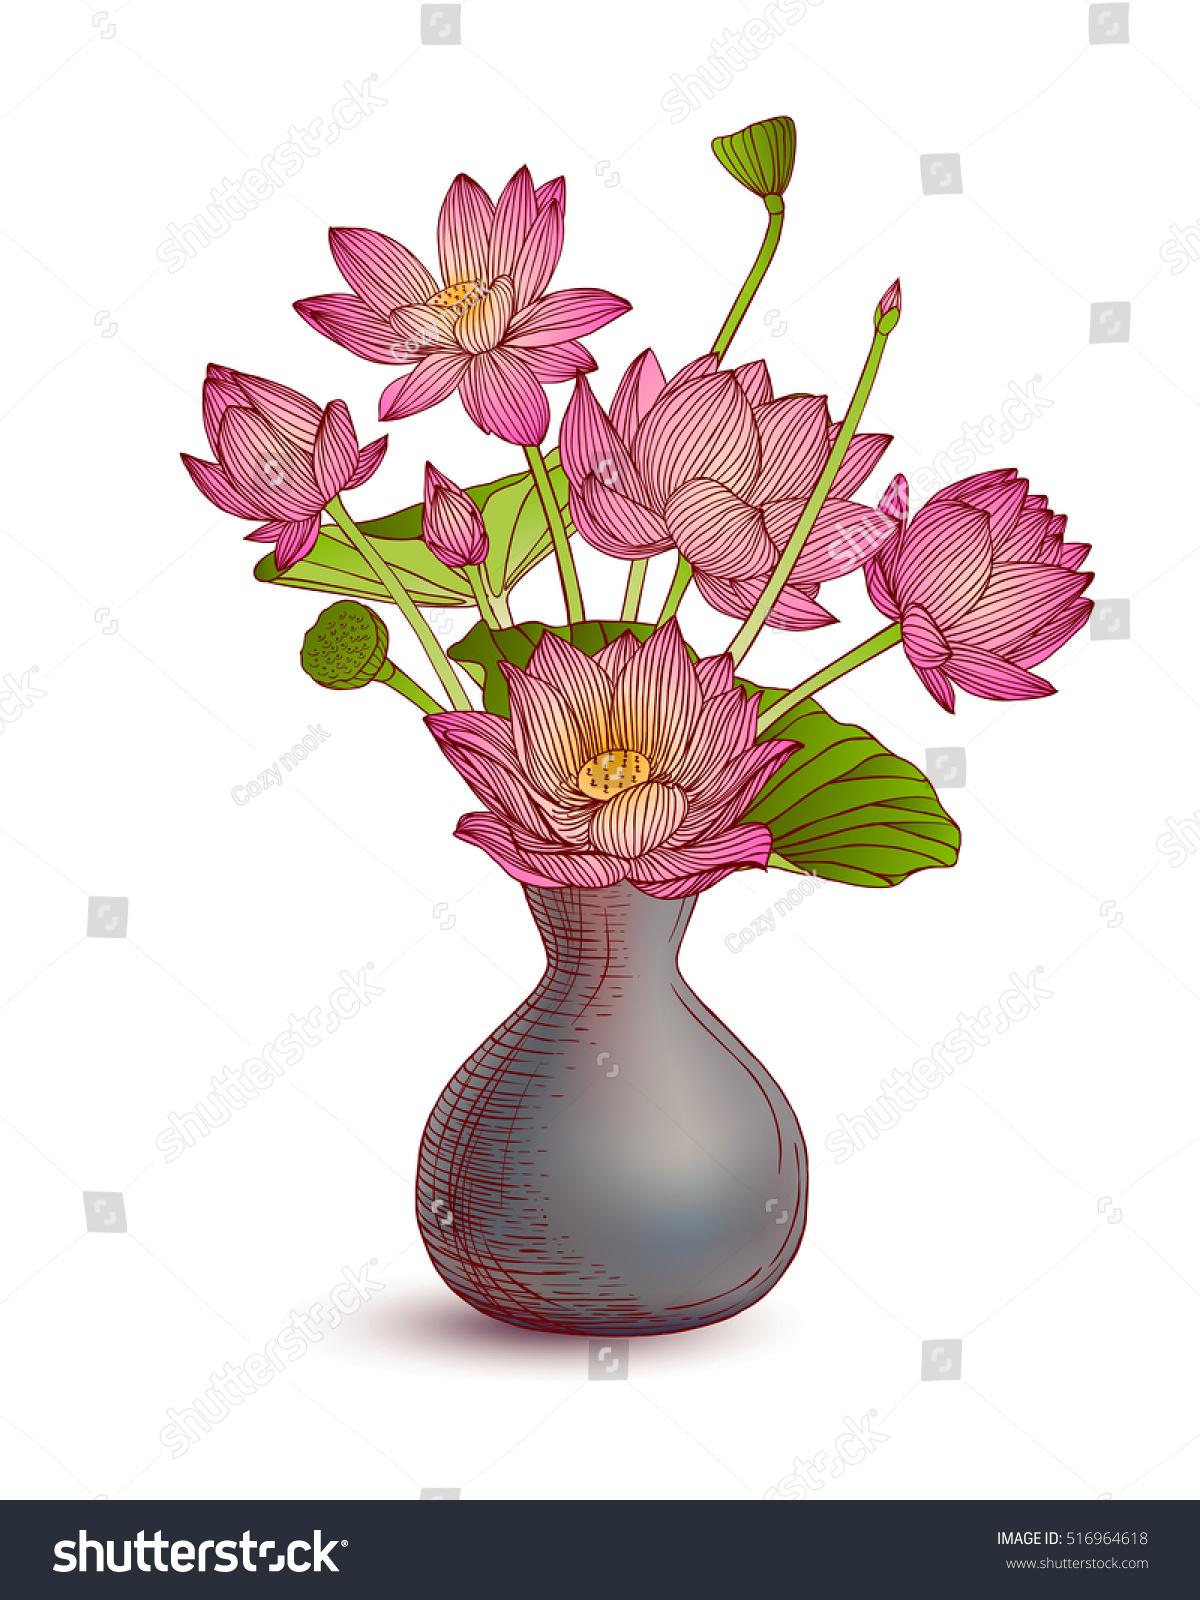 Vase Lotus Flowers On White Background Stock Vector Royalty Free